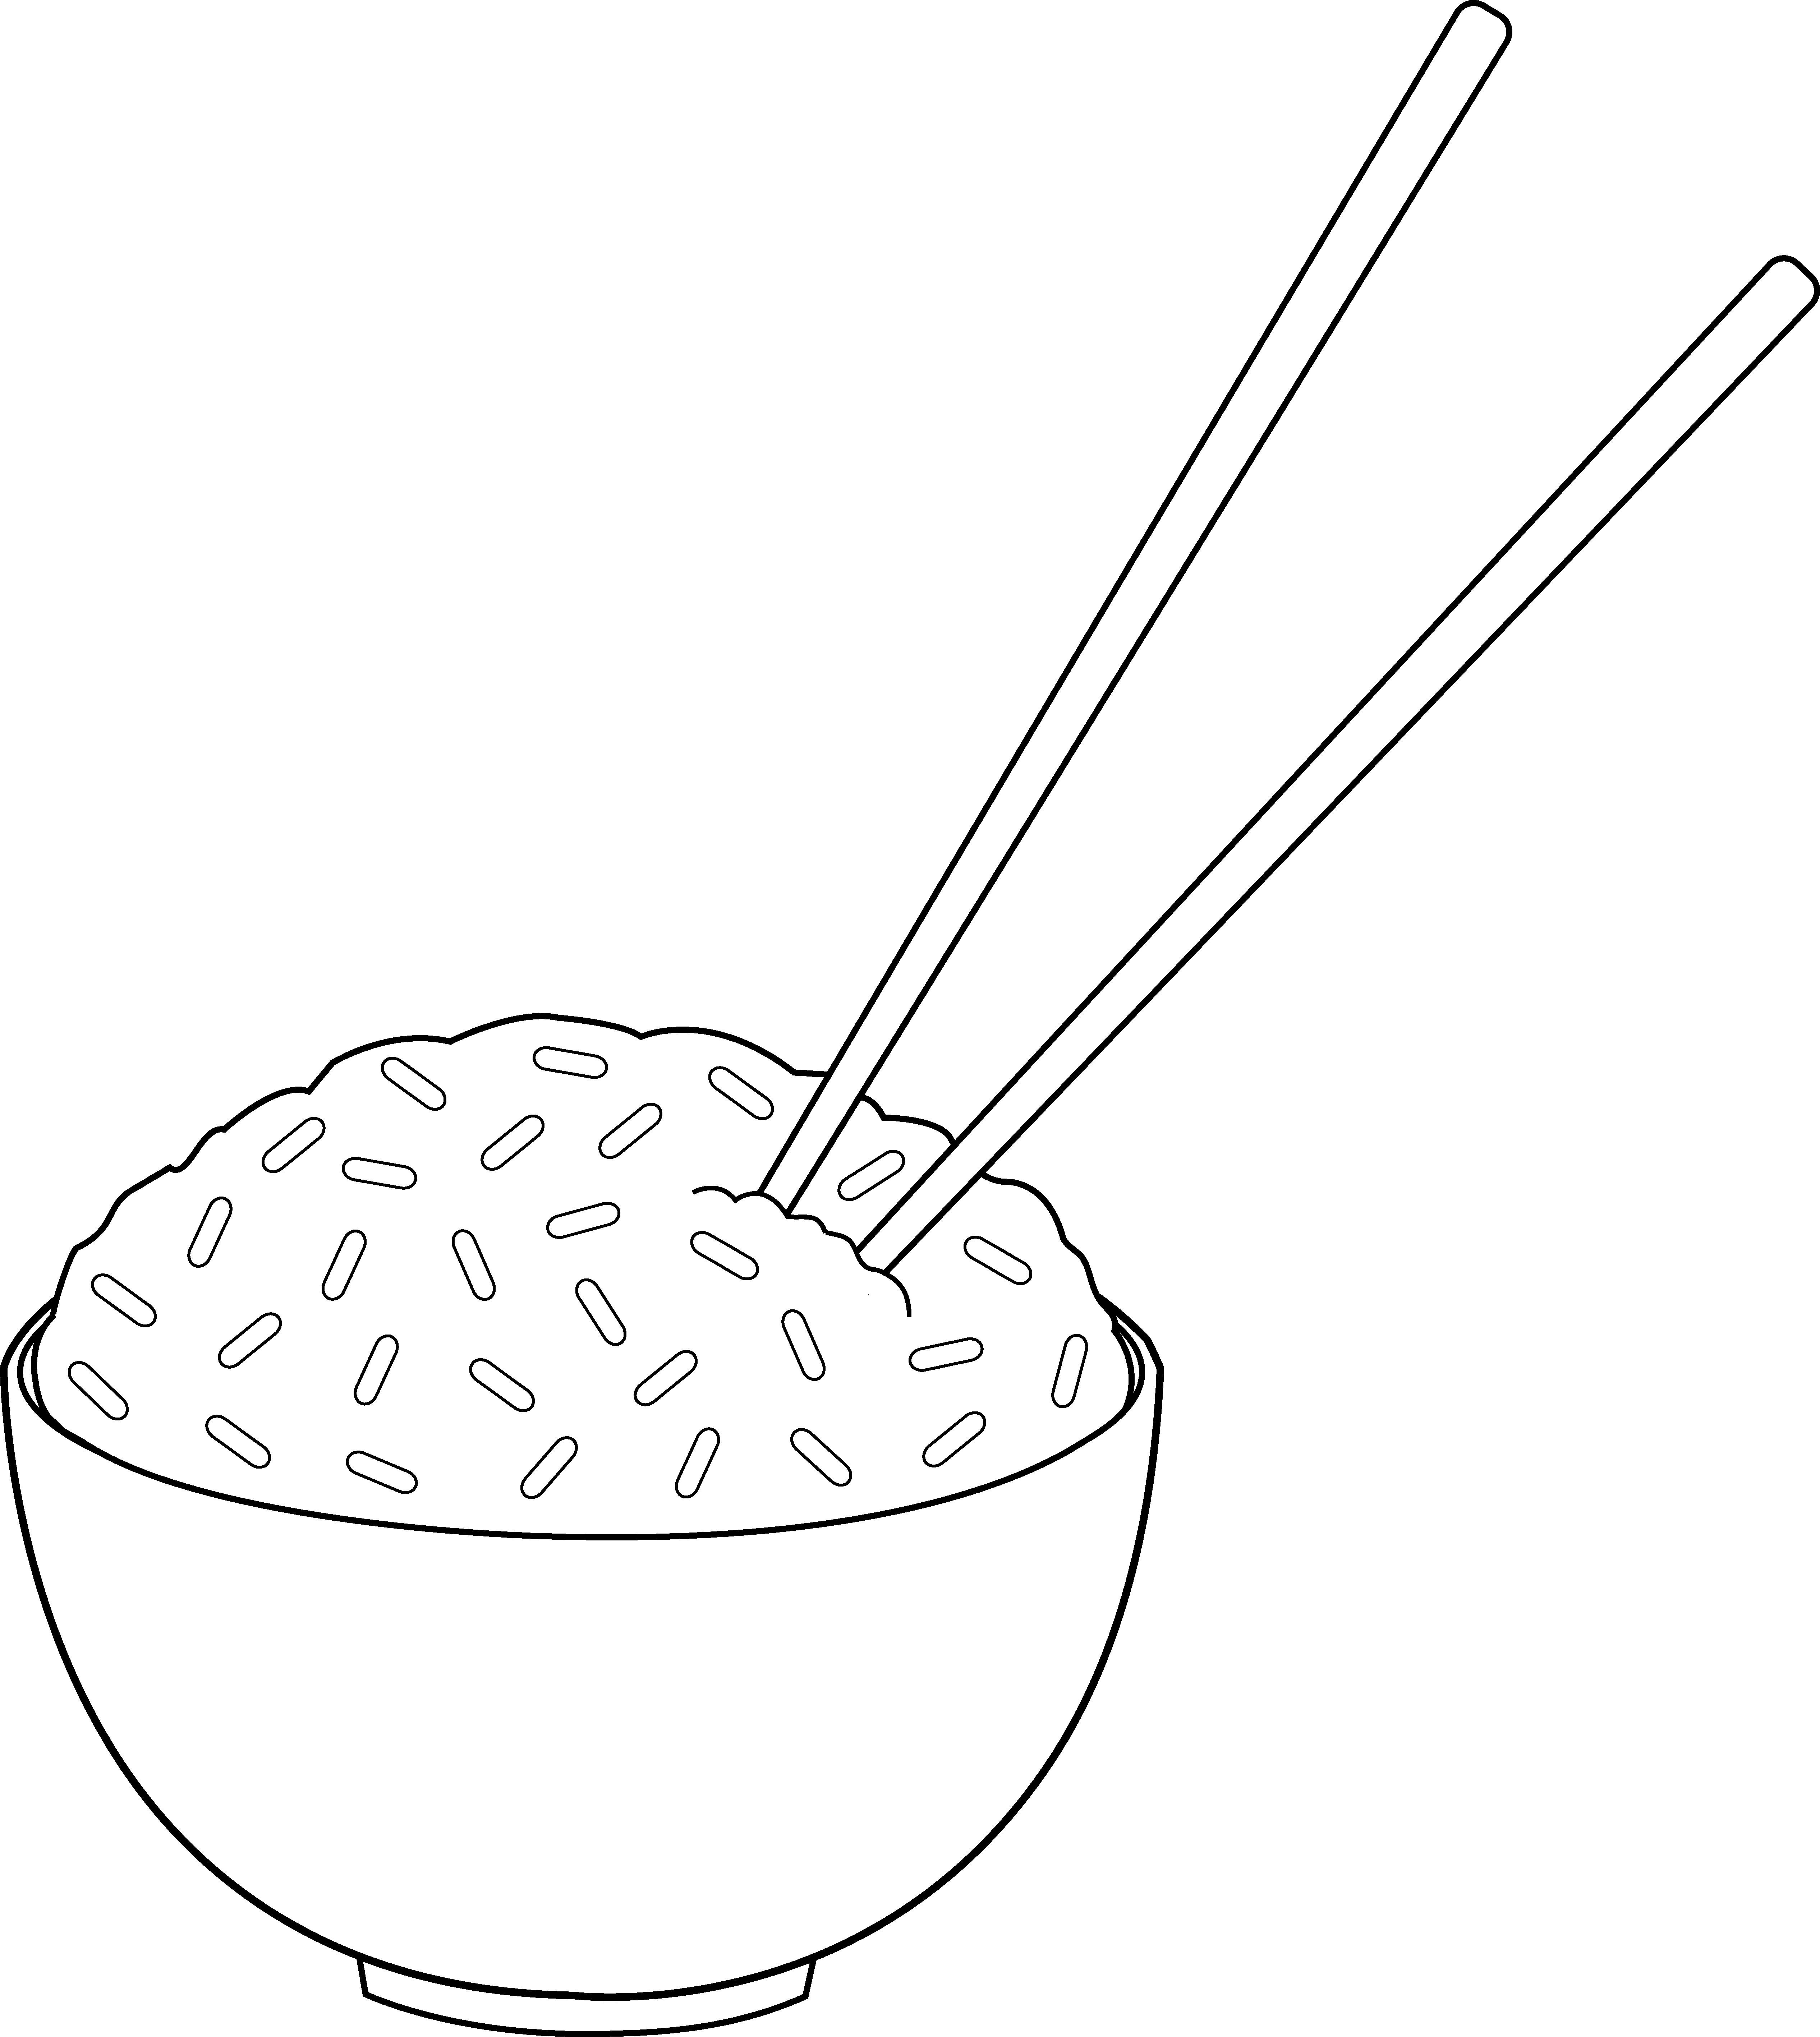 jpg download Chopsticks clipart drawing. Line art of rice.